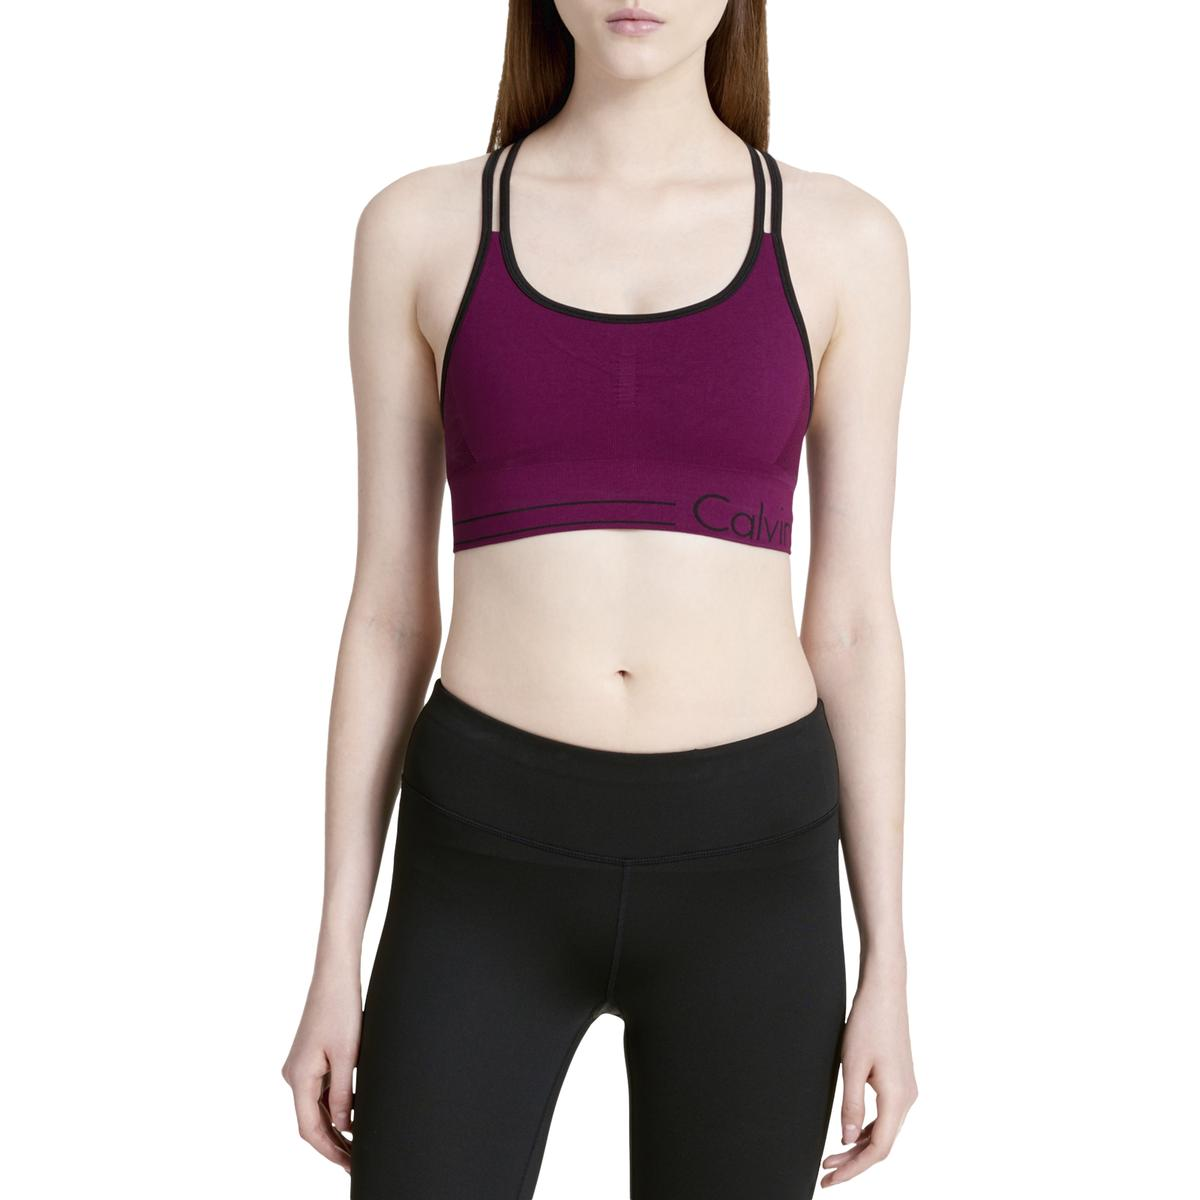 e380b7275b Calvin Klein Performance Womens Red Low Impact Sports Bra Athletic S ...